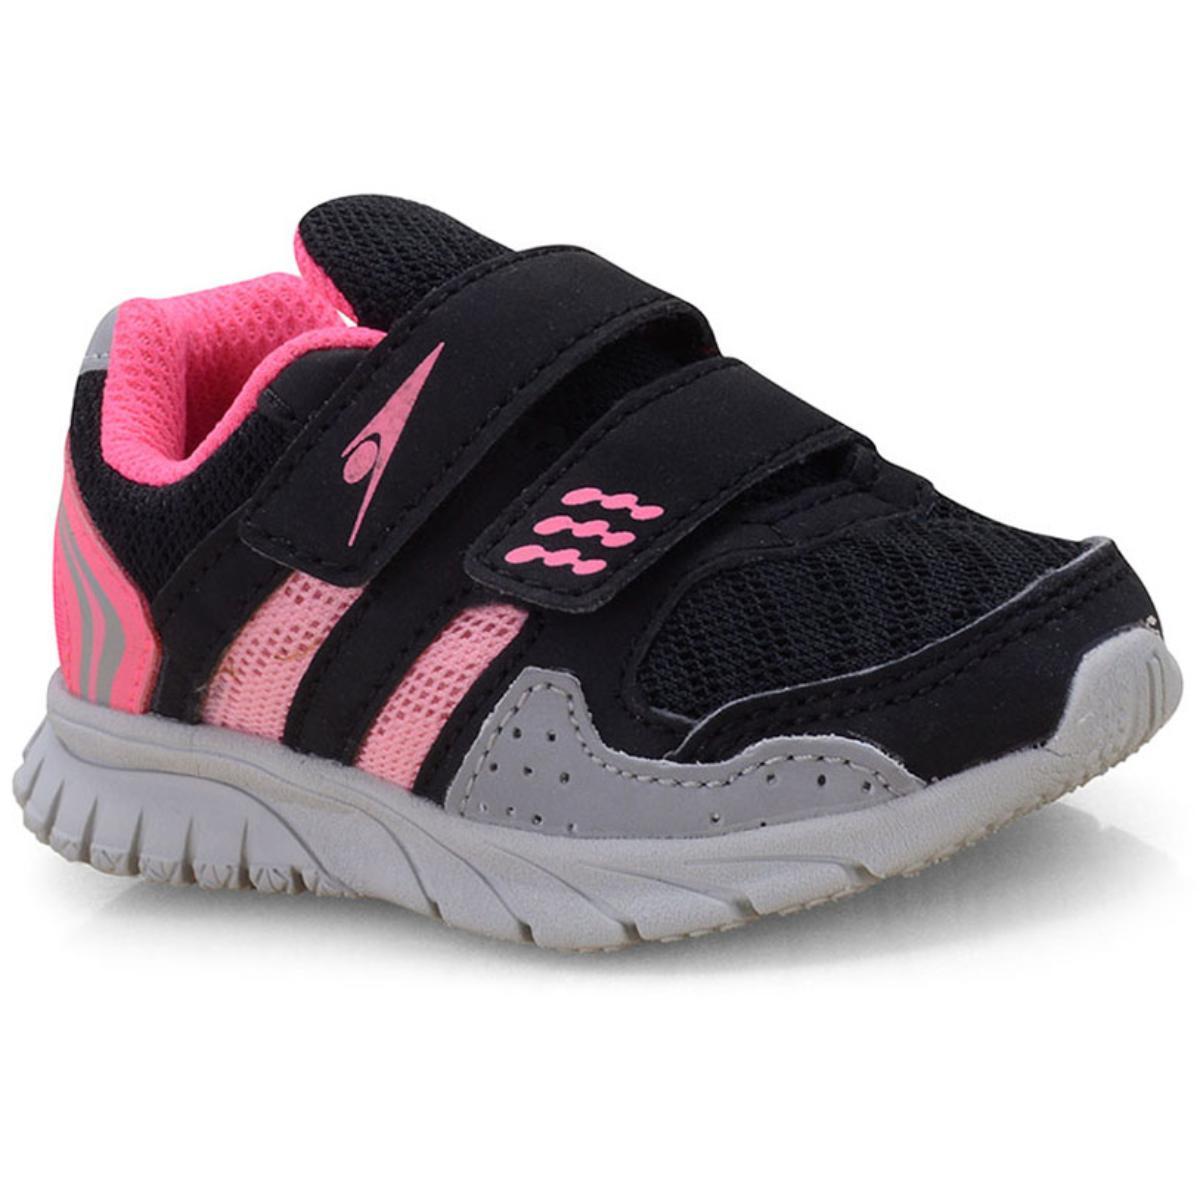 Tênis Fem Infantil Klin 481.052 Preto/pink